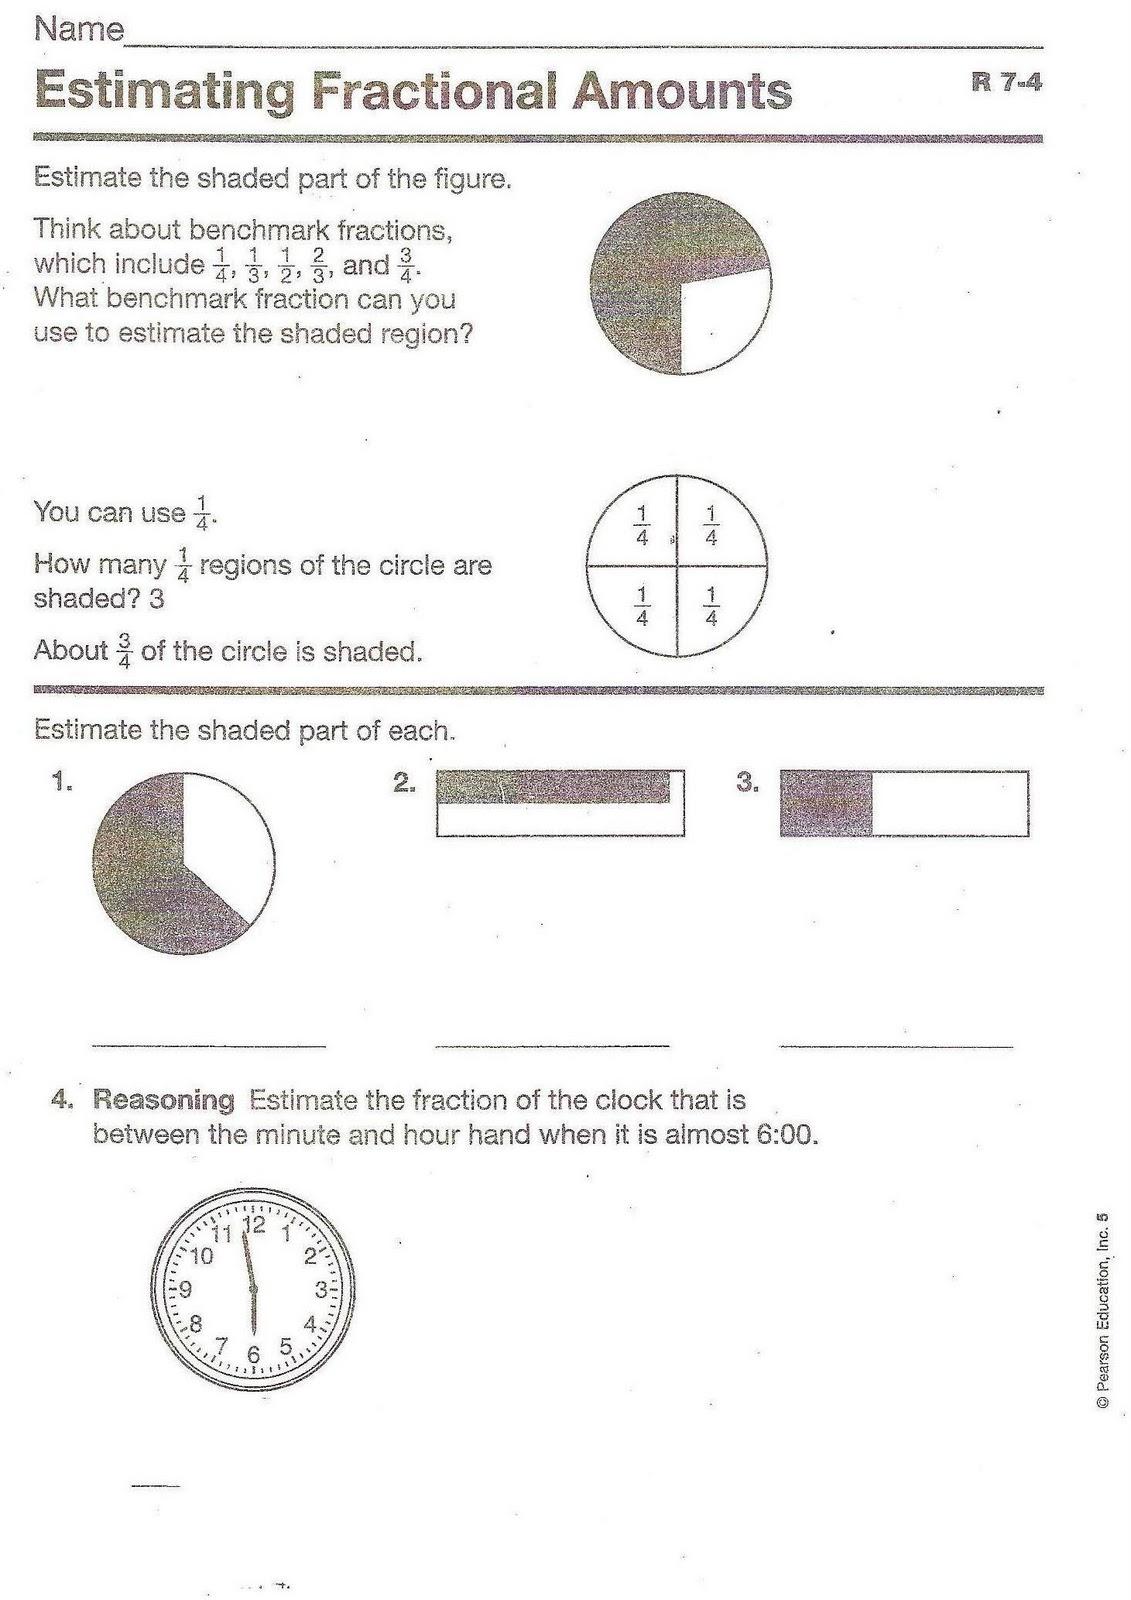 5th Grade At Sage Hills 7 4 Math Homework Estimating Fraction Amounts